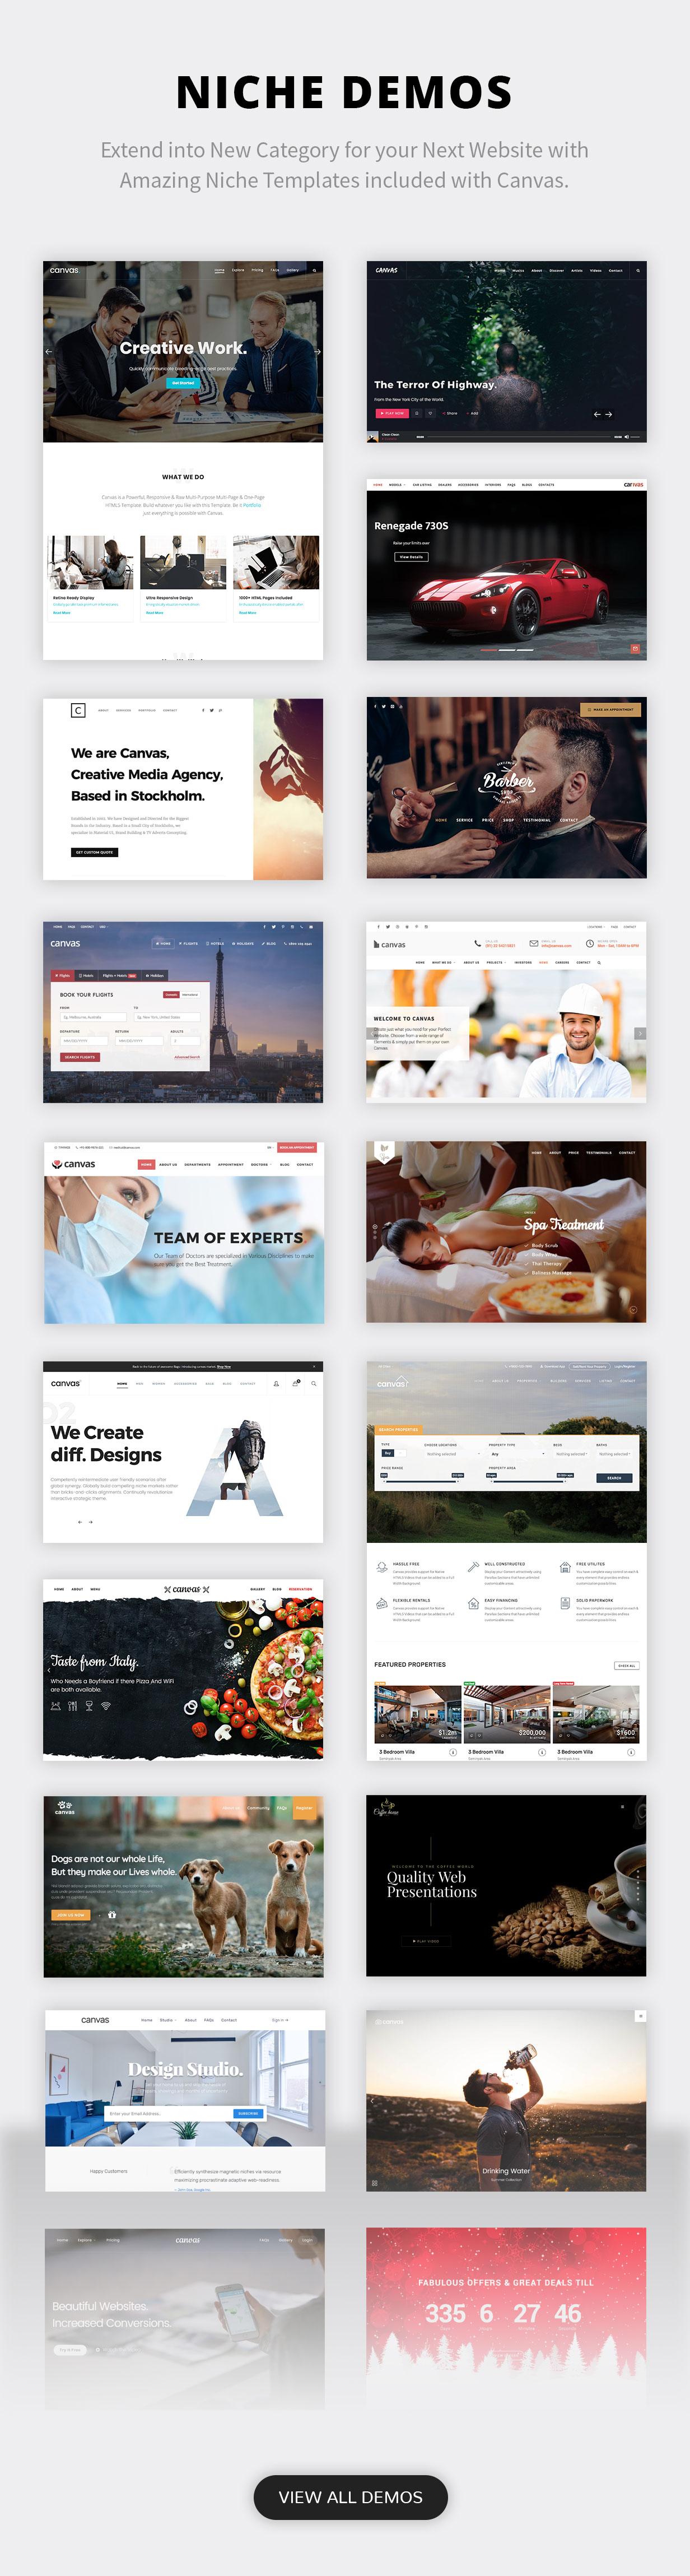 Canvas | The Multi-Purpose HTML5 Template by SemiColonWeb | ThemeForest